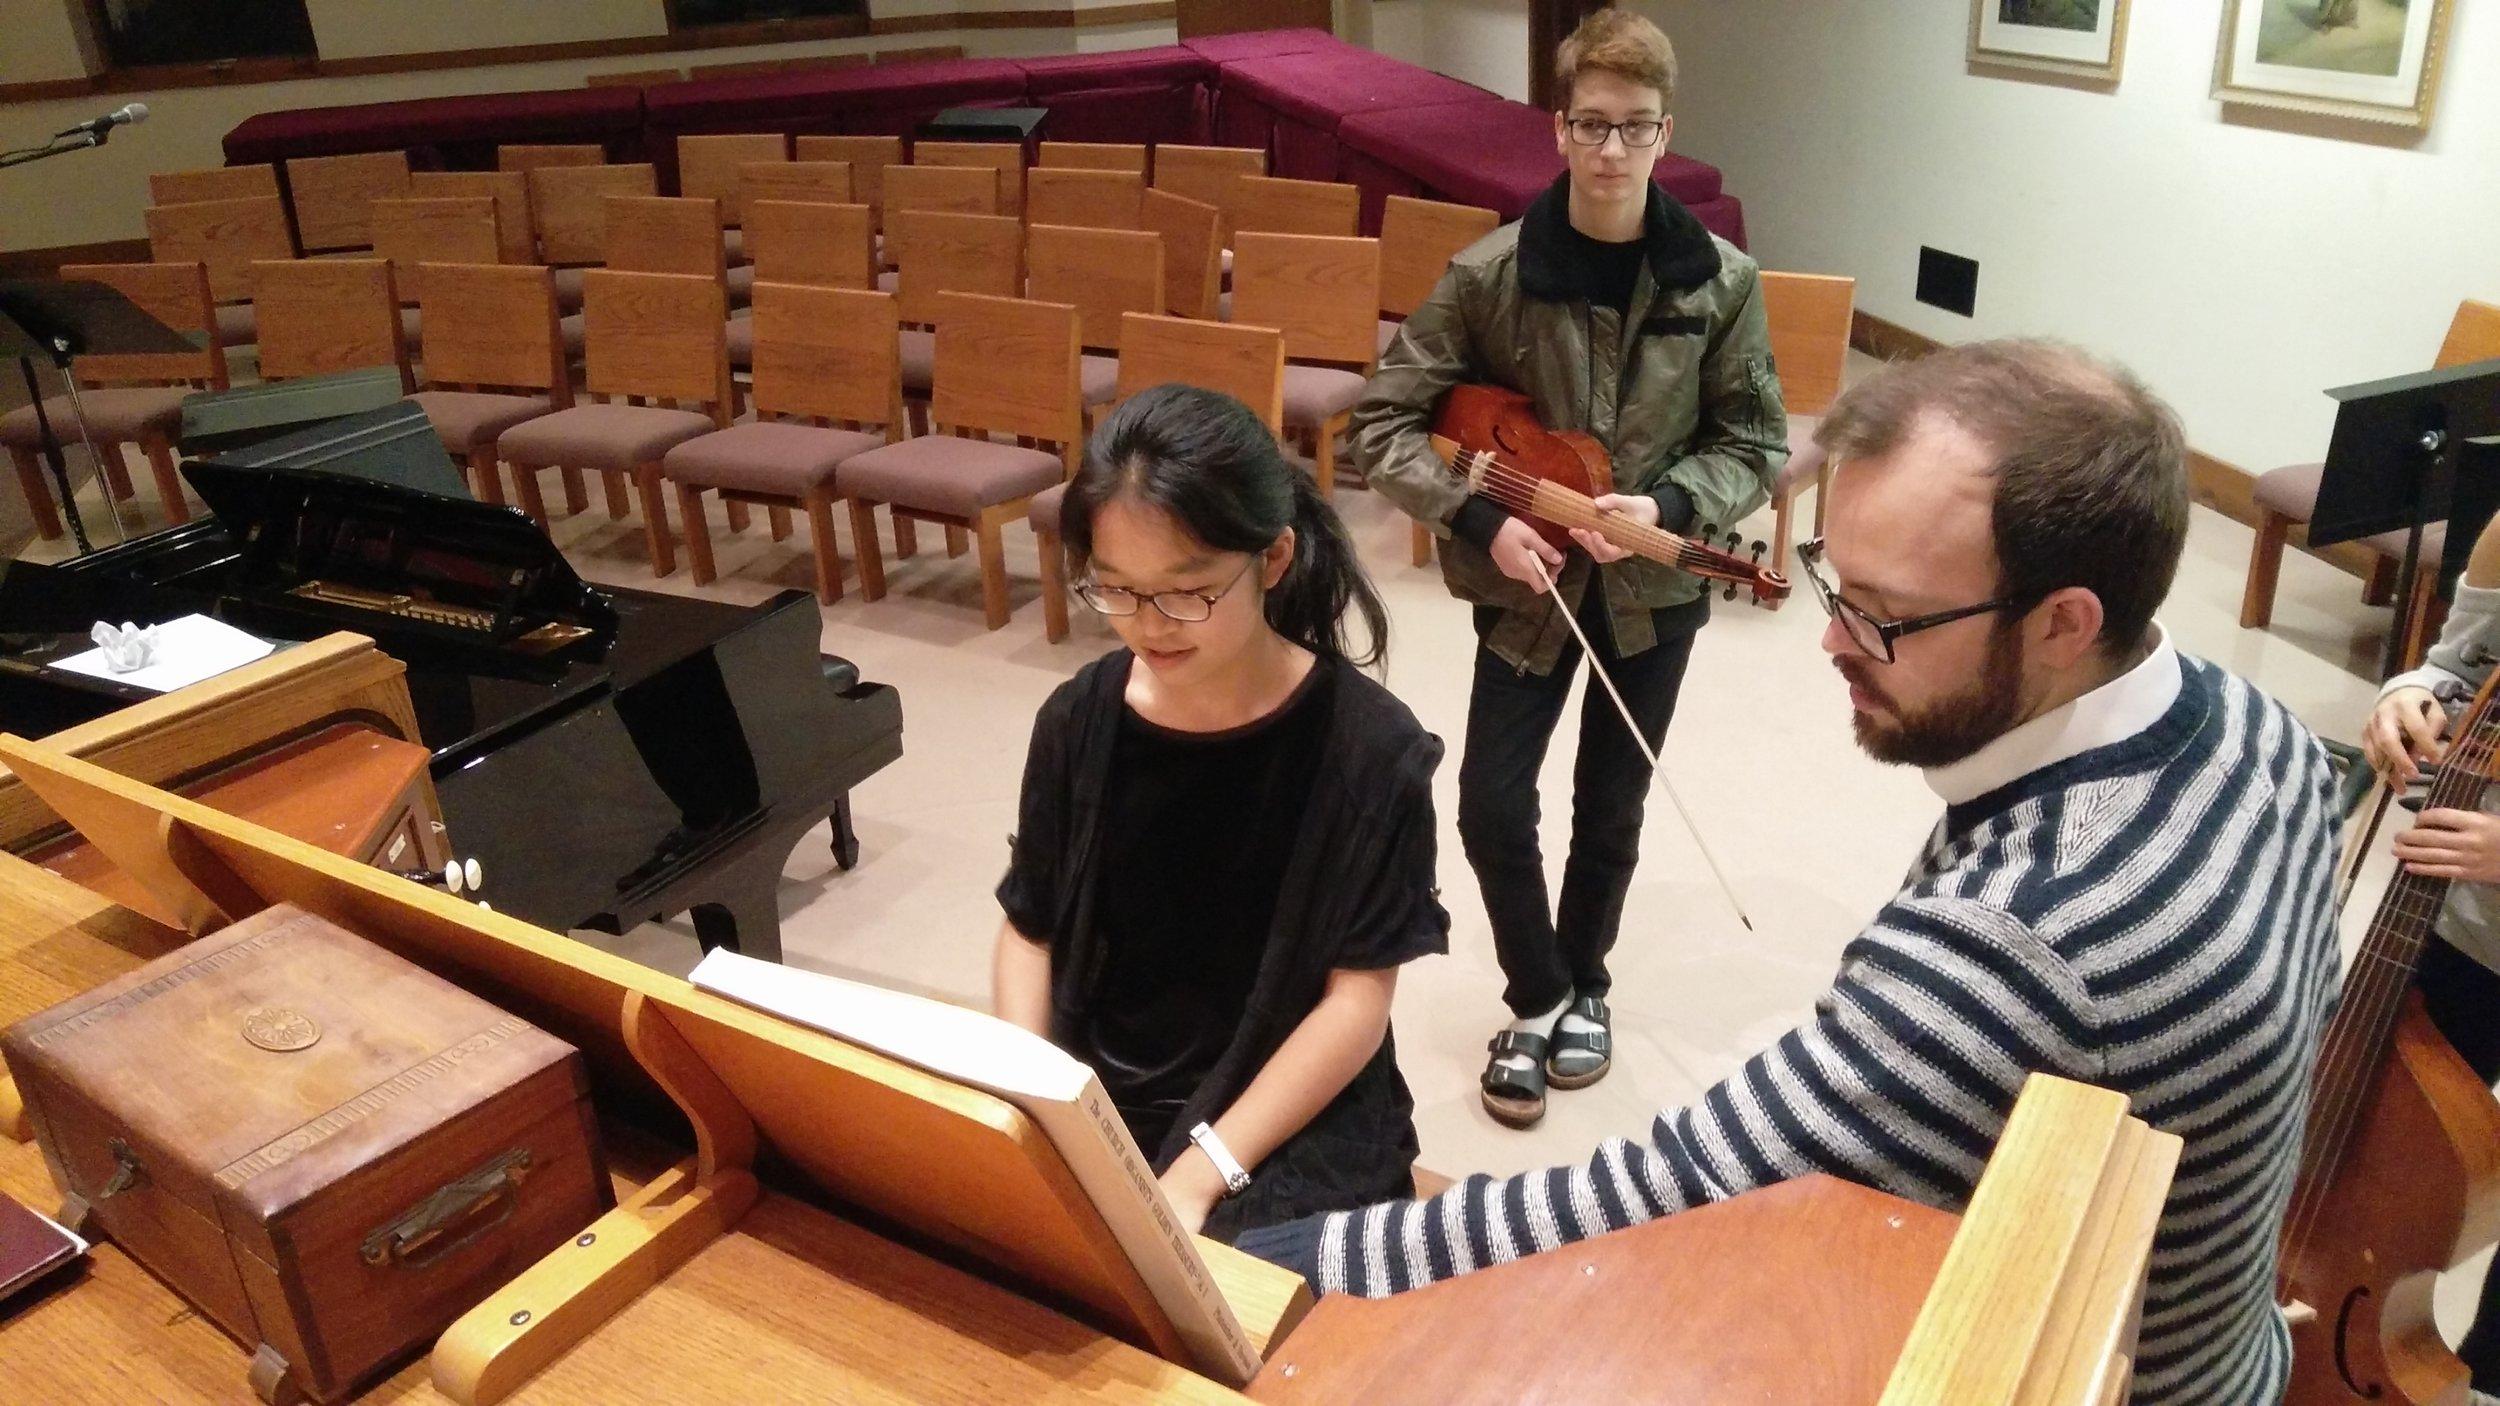 Some fun at the organ with Cantor Giuliani